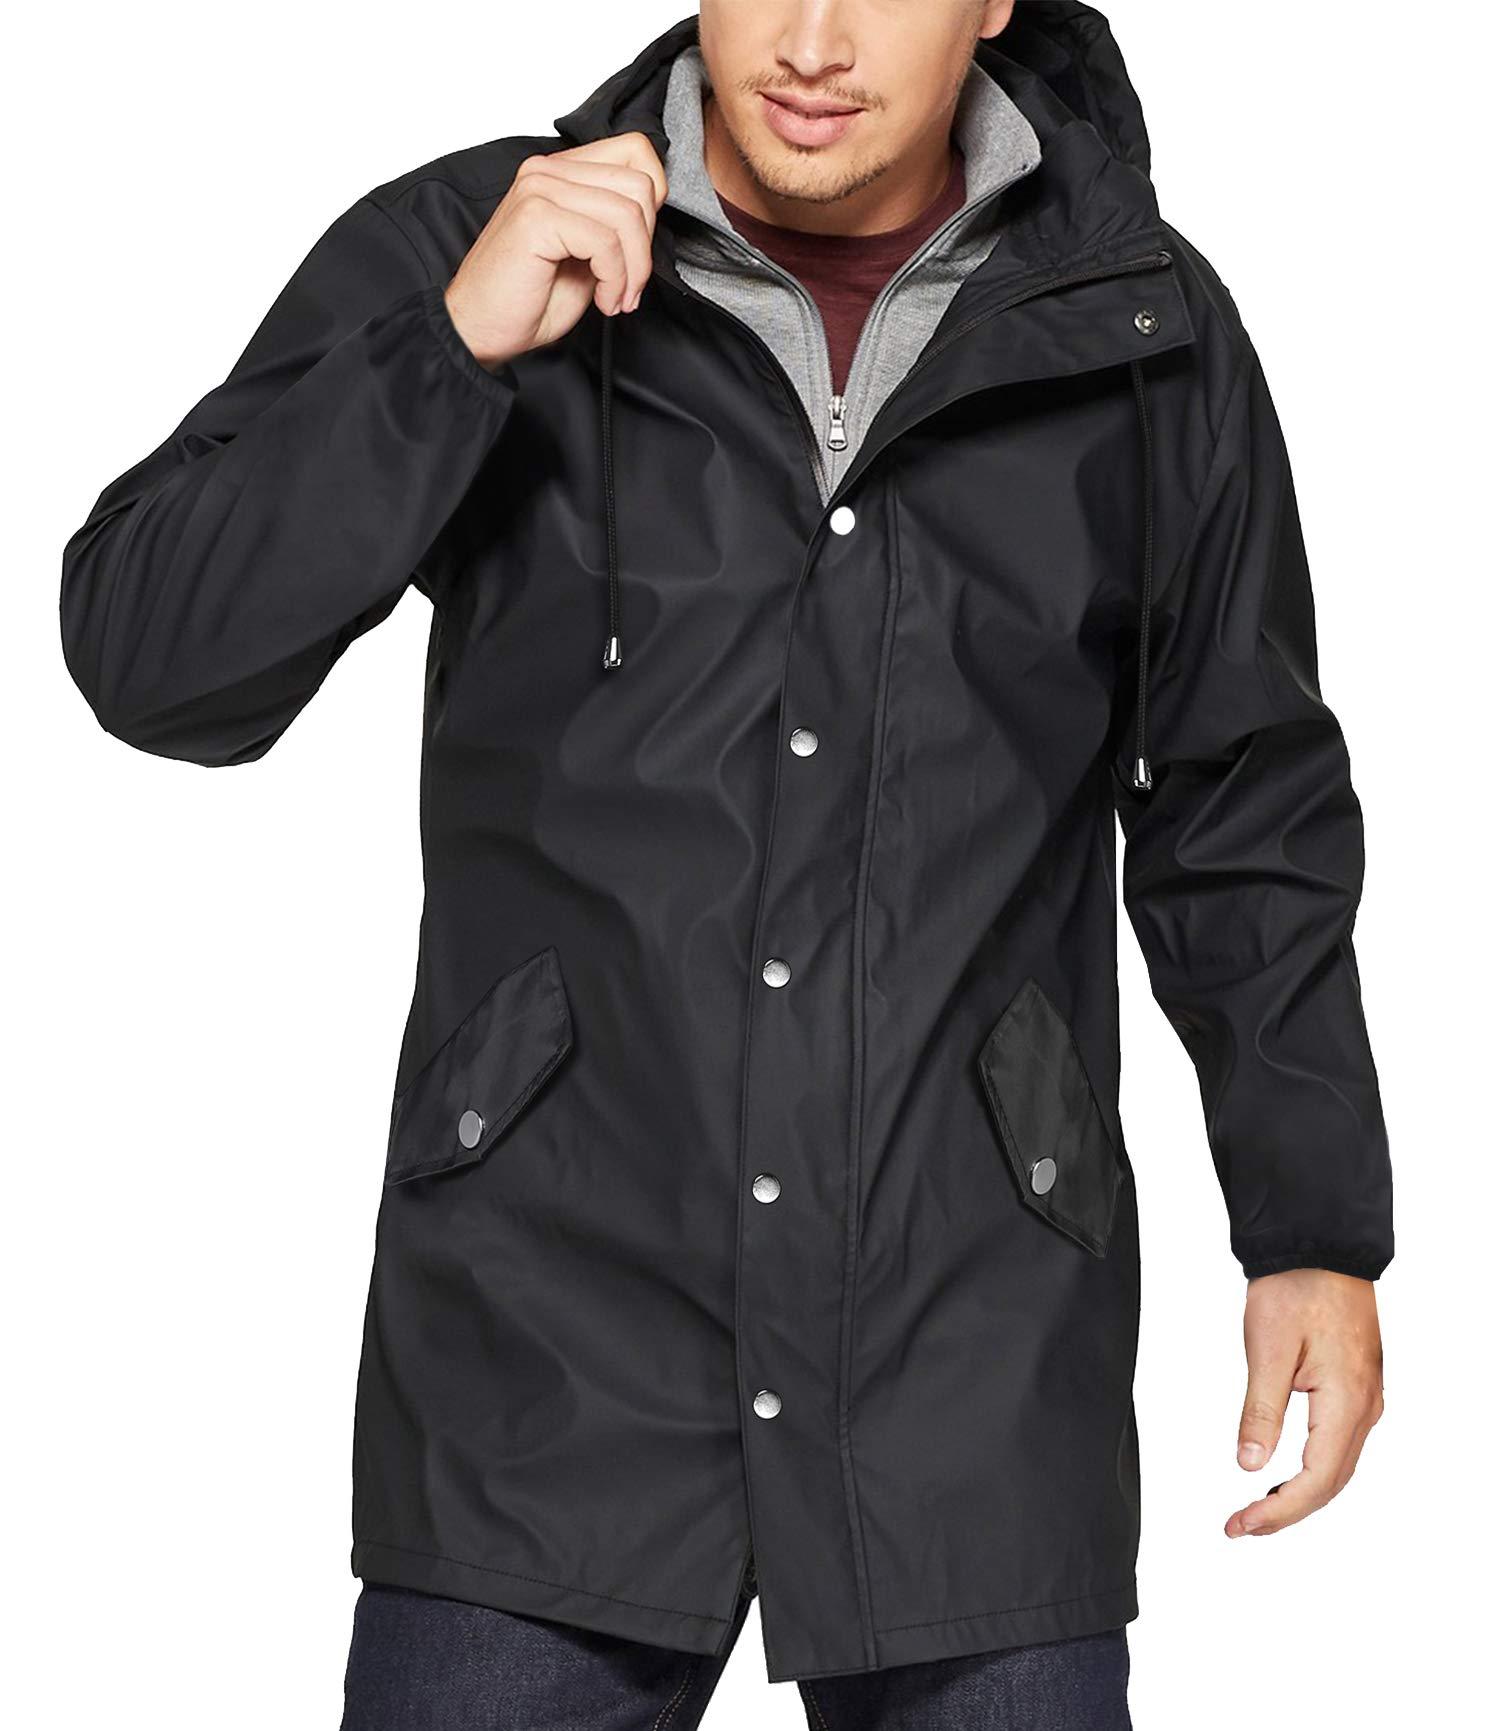 URRU Men's Long Sleeve Adjustable Drawstring Hood Functional Rain Coat Black M by URRU